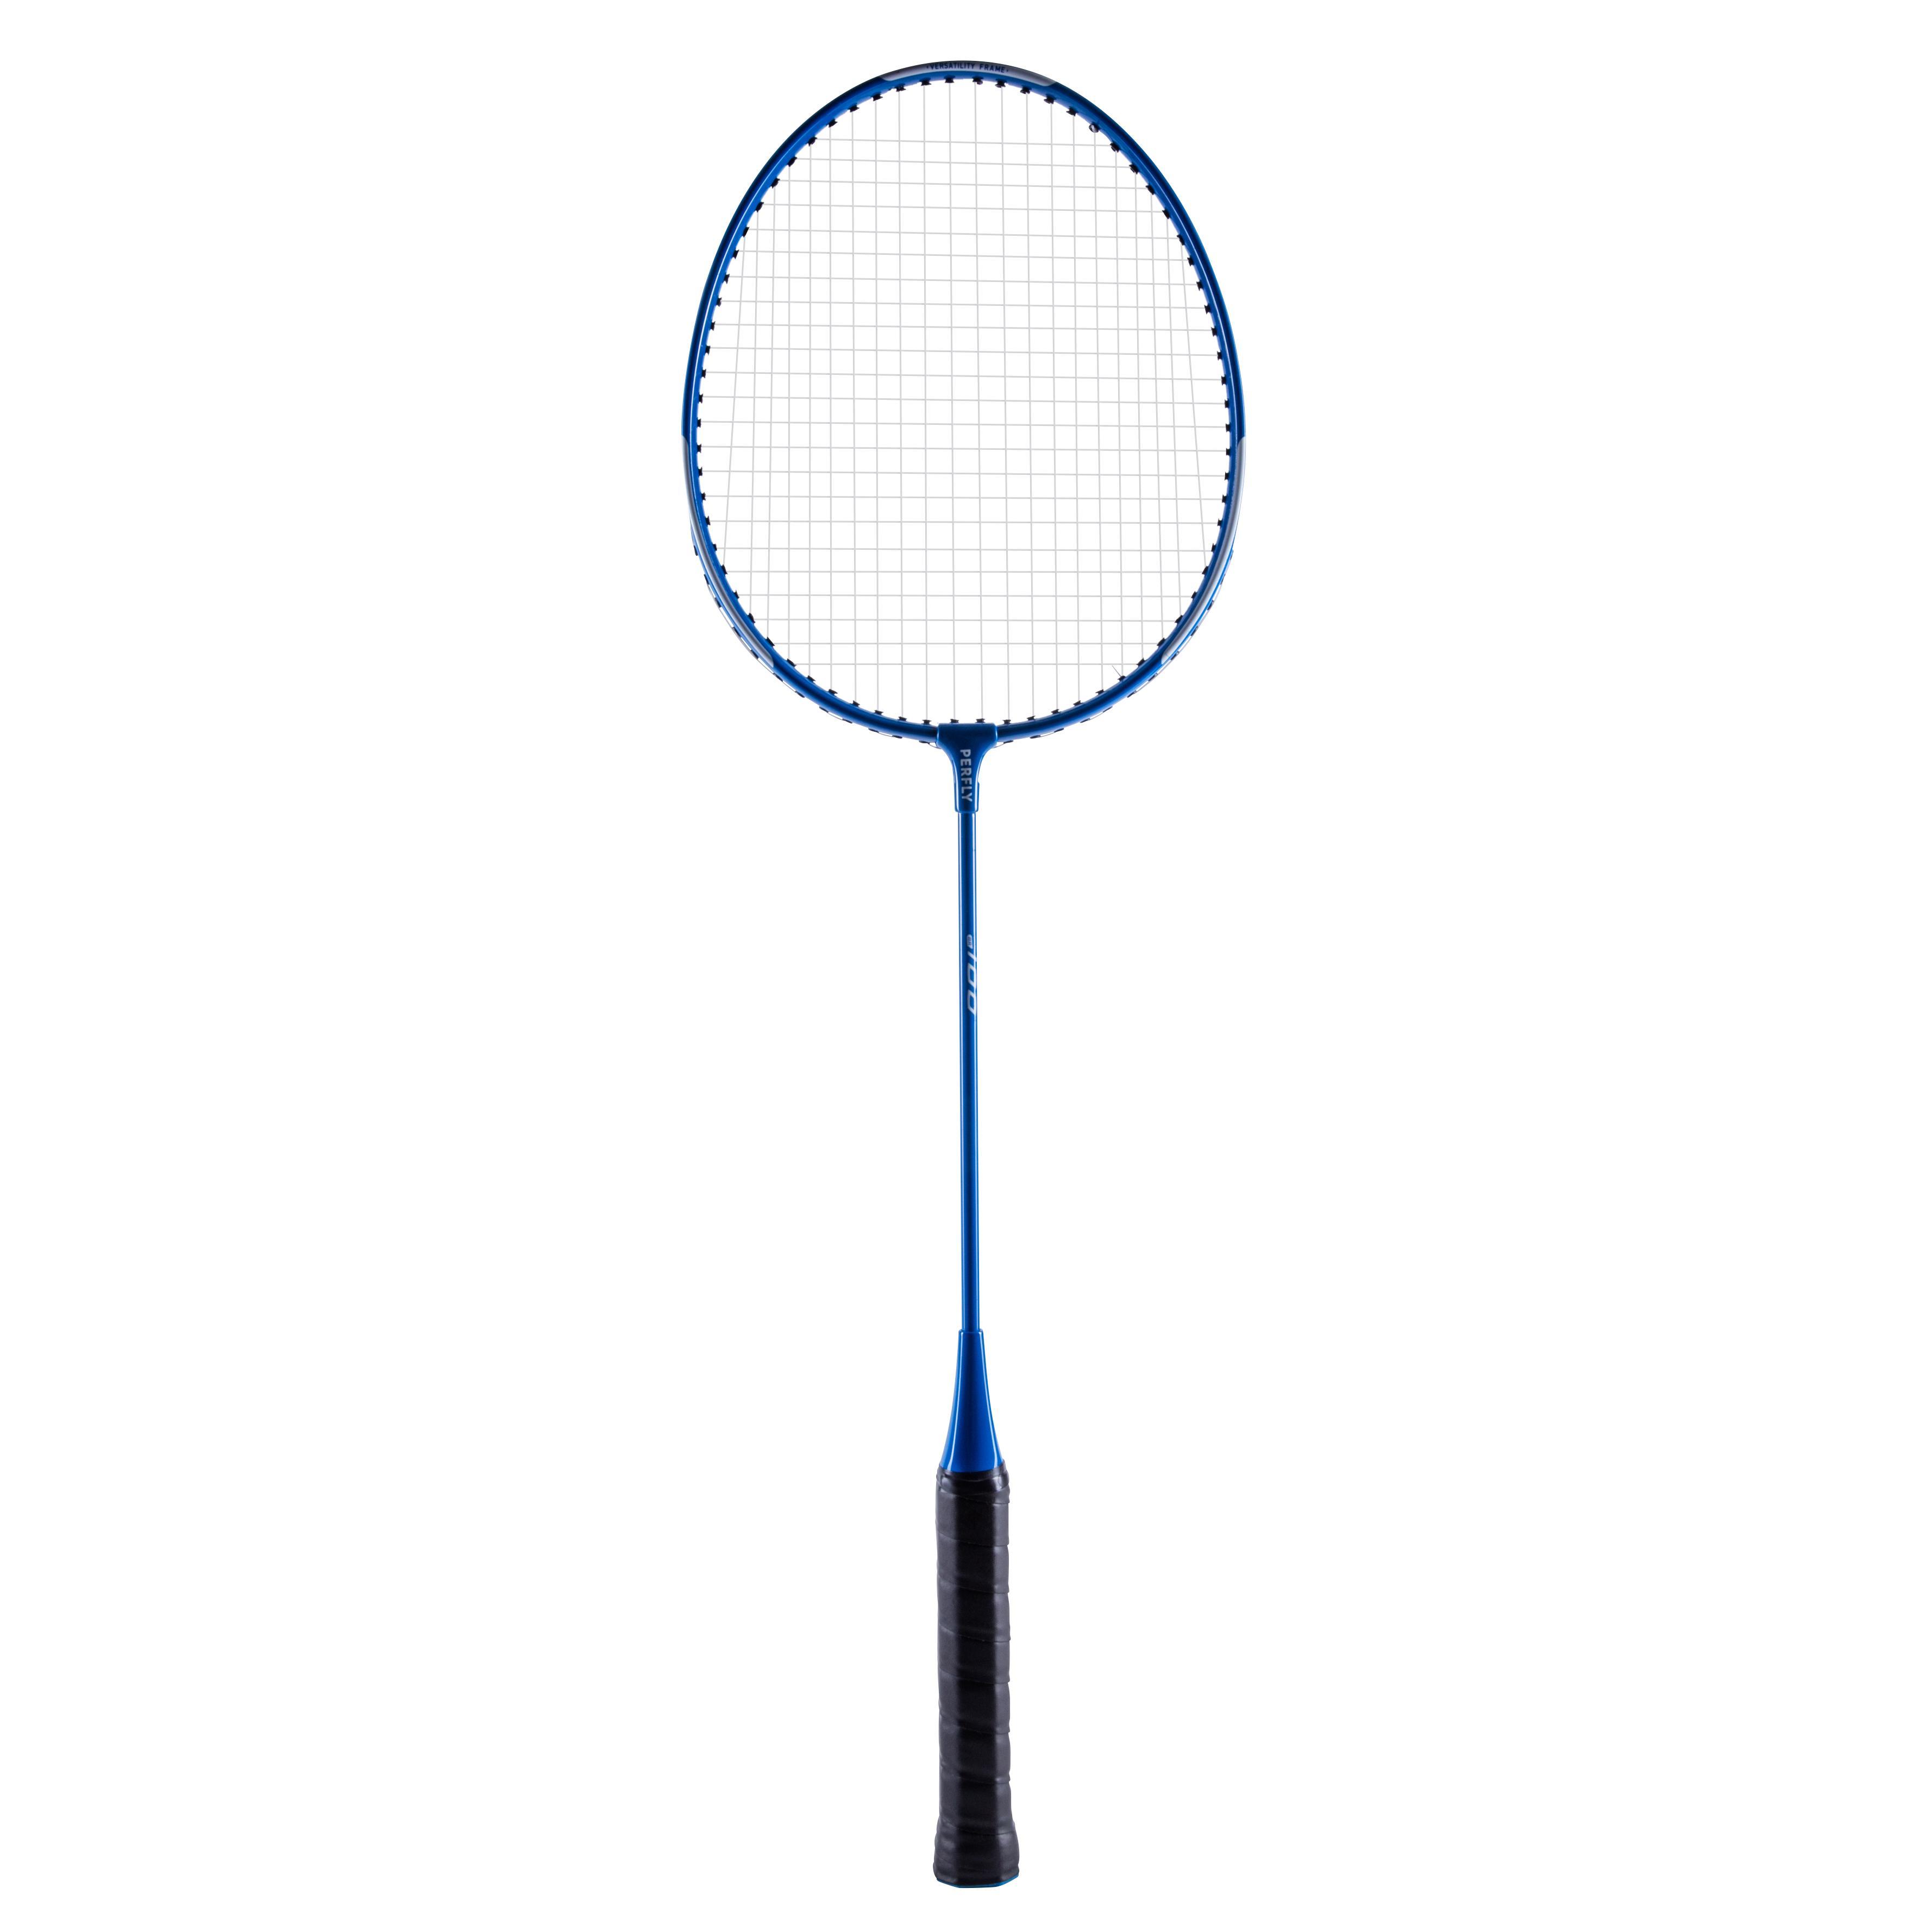 Rachetă badminton BR 100 la Reducere poza